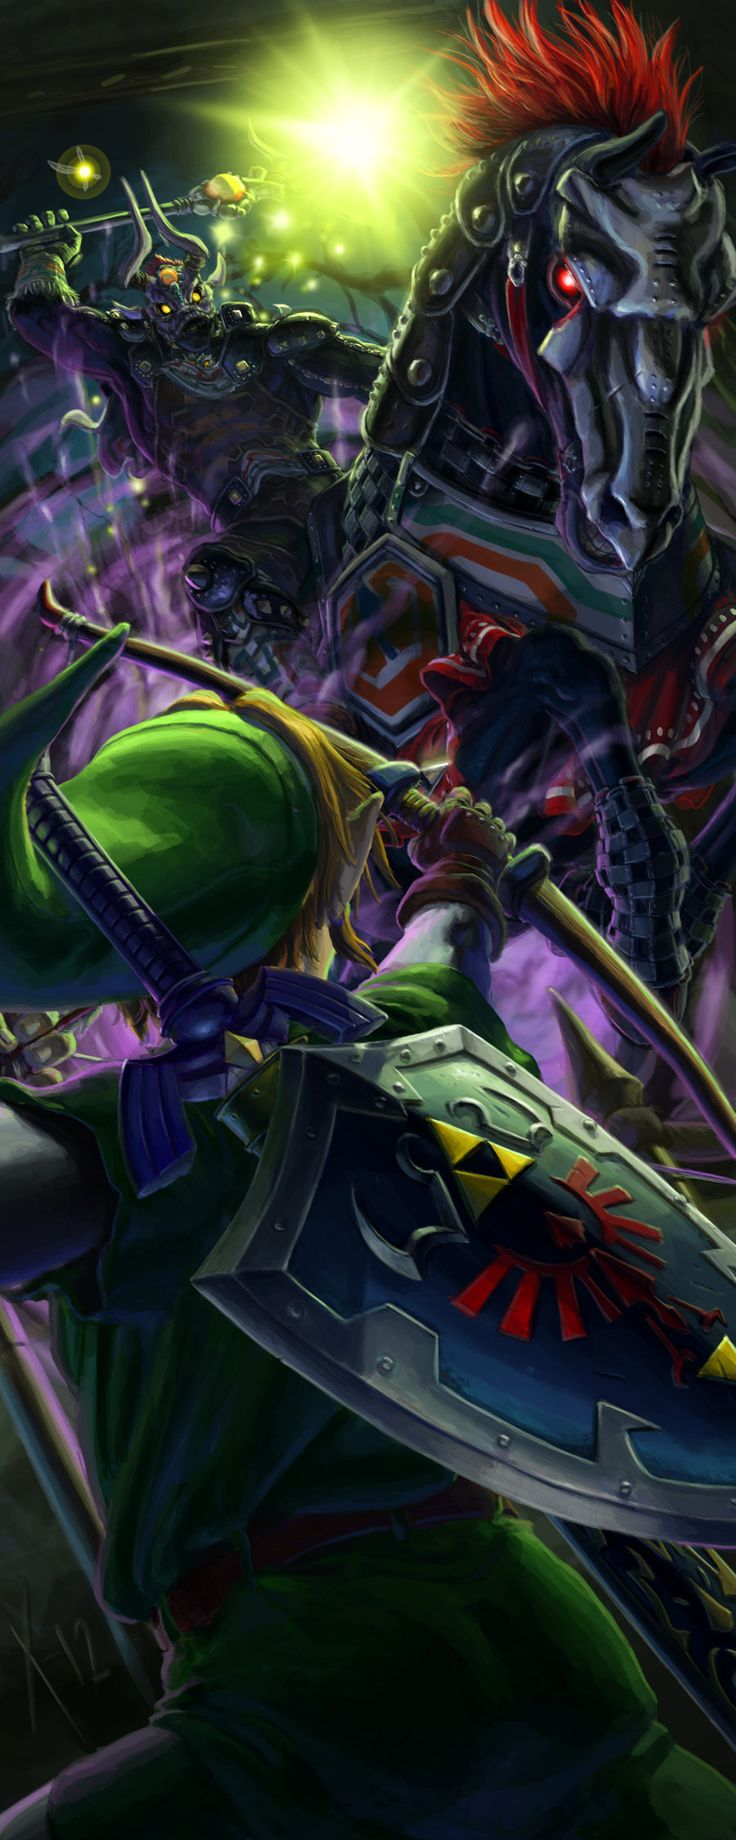 Link vs Phantom Ganon by Txikimorin.deviantart.com on @deviantART